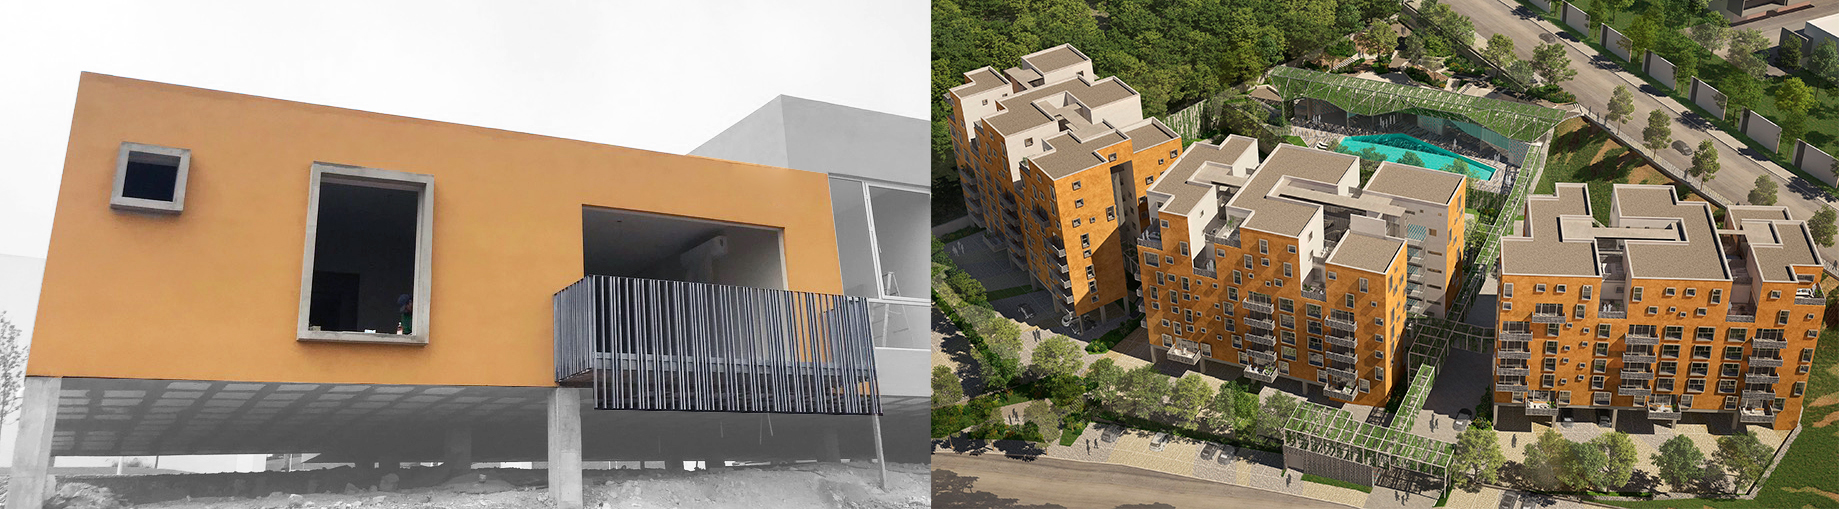 Piso piloto México Picharchitects Arquitectura Sustentable en México